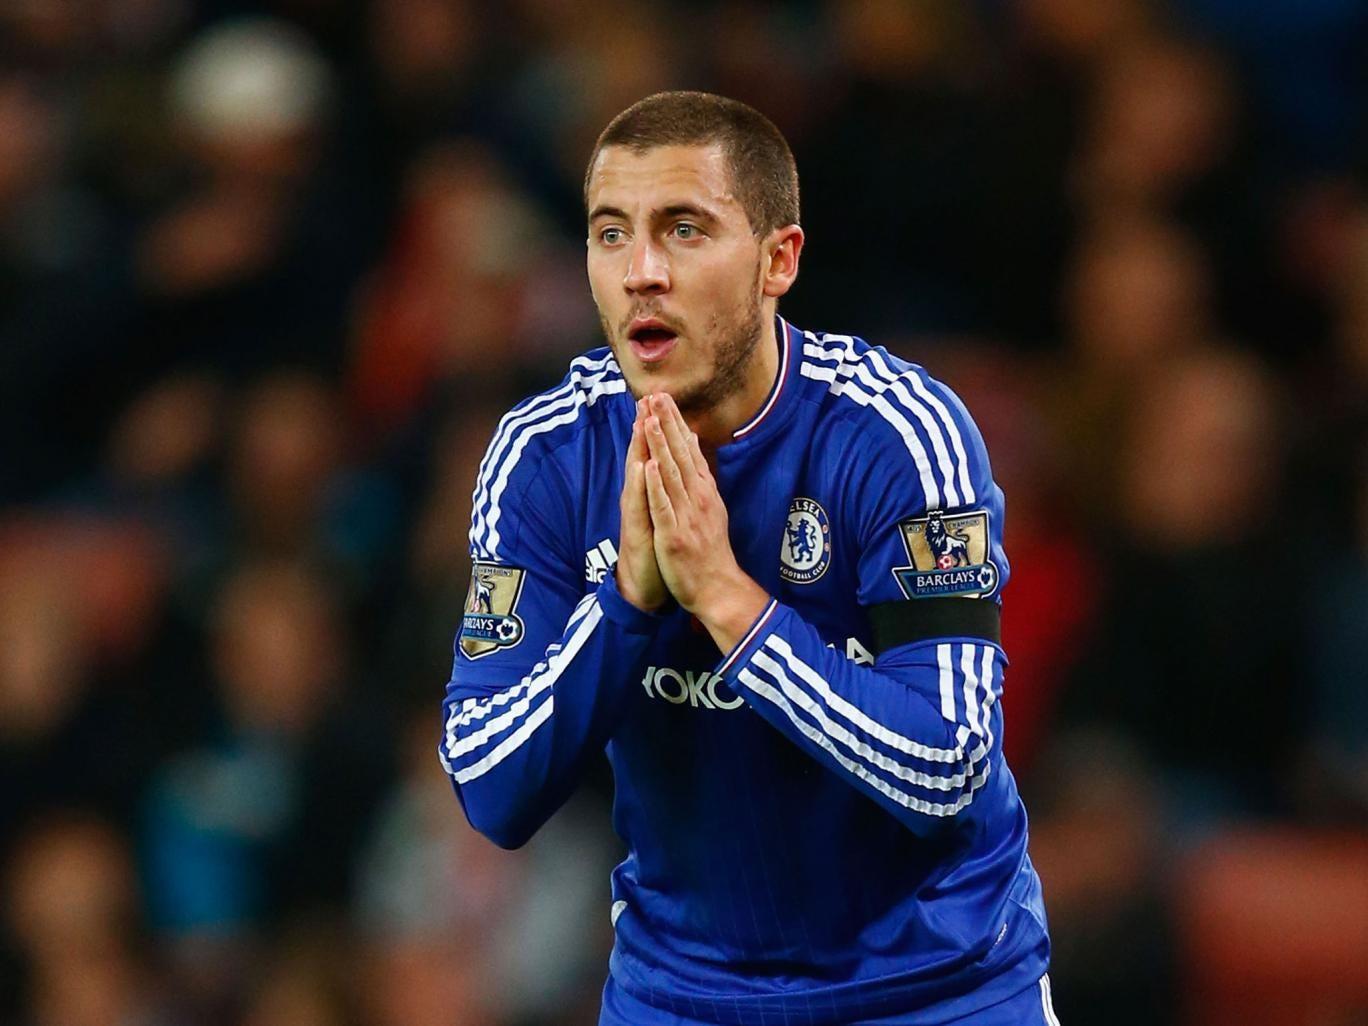 Eden Hazard Needs To Find His Swagger, Says Chelsea Boss Guus Hiddink